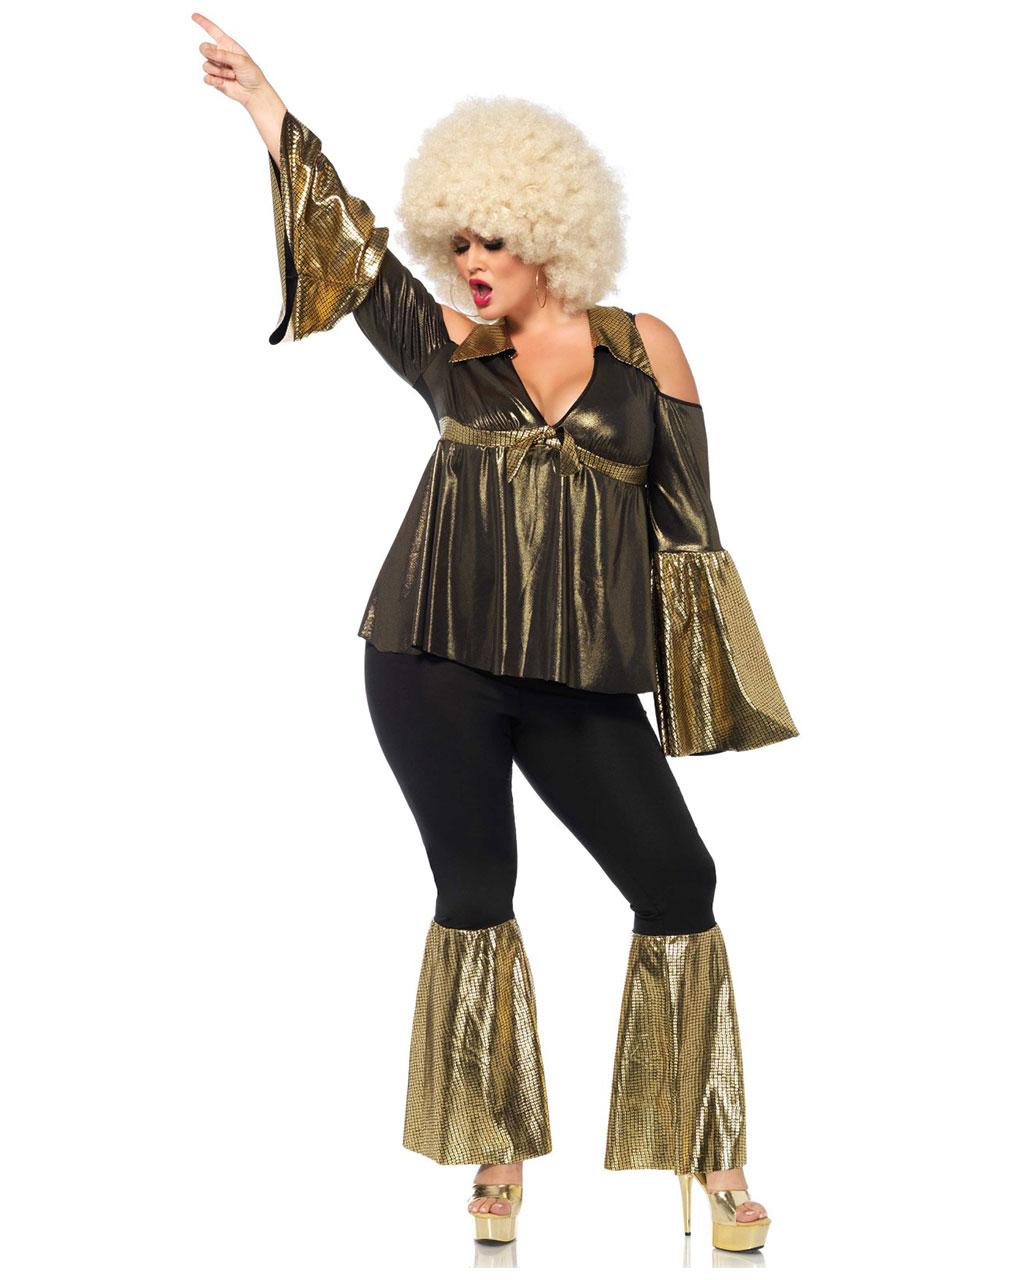 1bac600b5019 Disco Diva Plus Size Costume for theme parties! | horror-shop.com